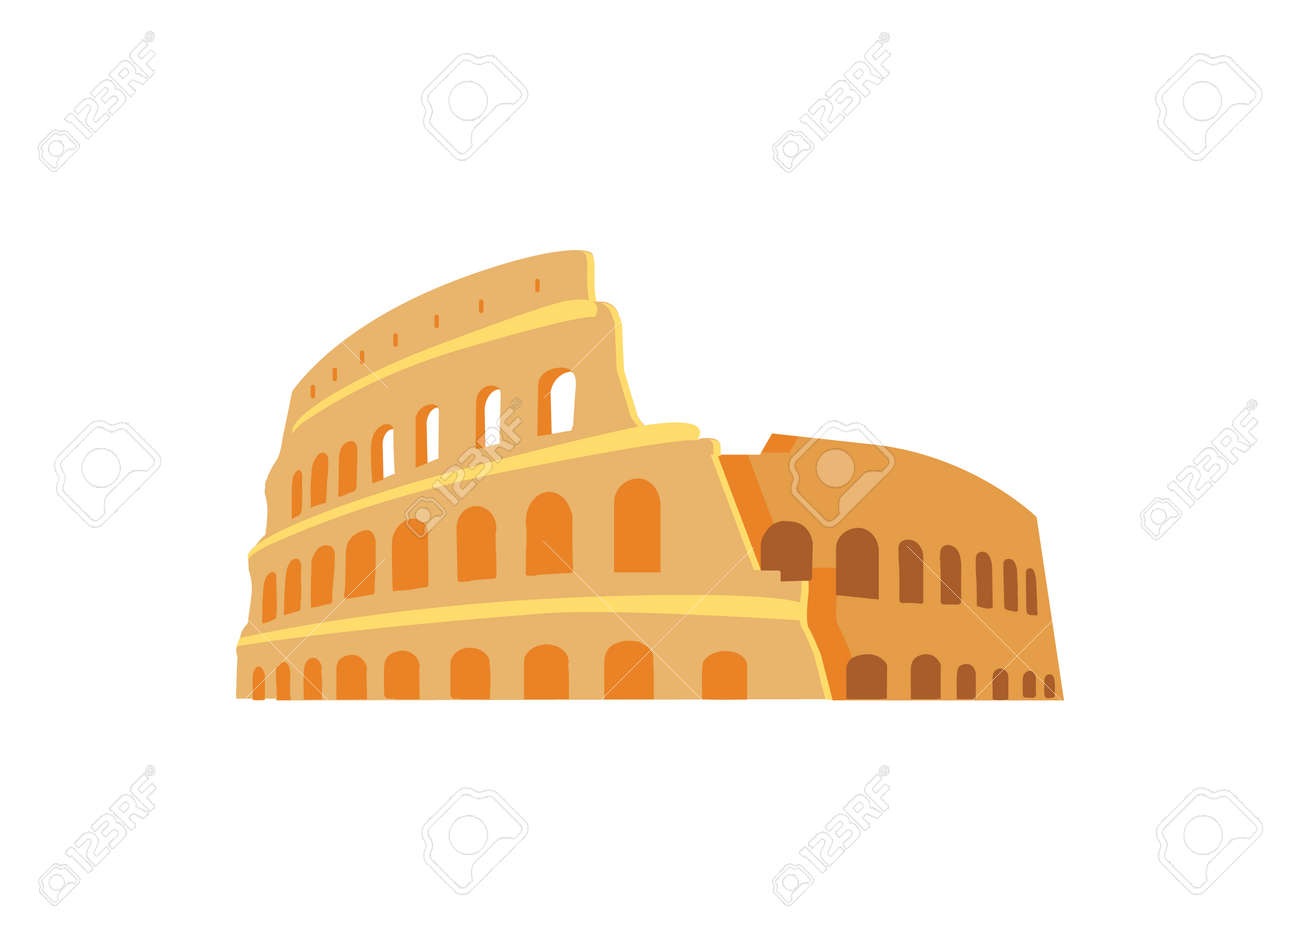 Roman Coliseum Ruins in Ancient Architecture Style - 109854440